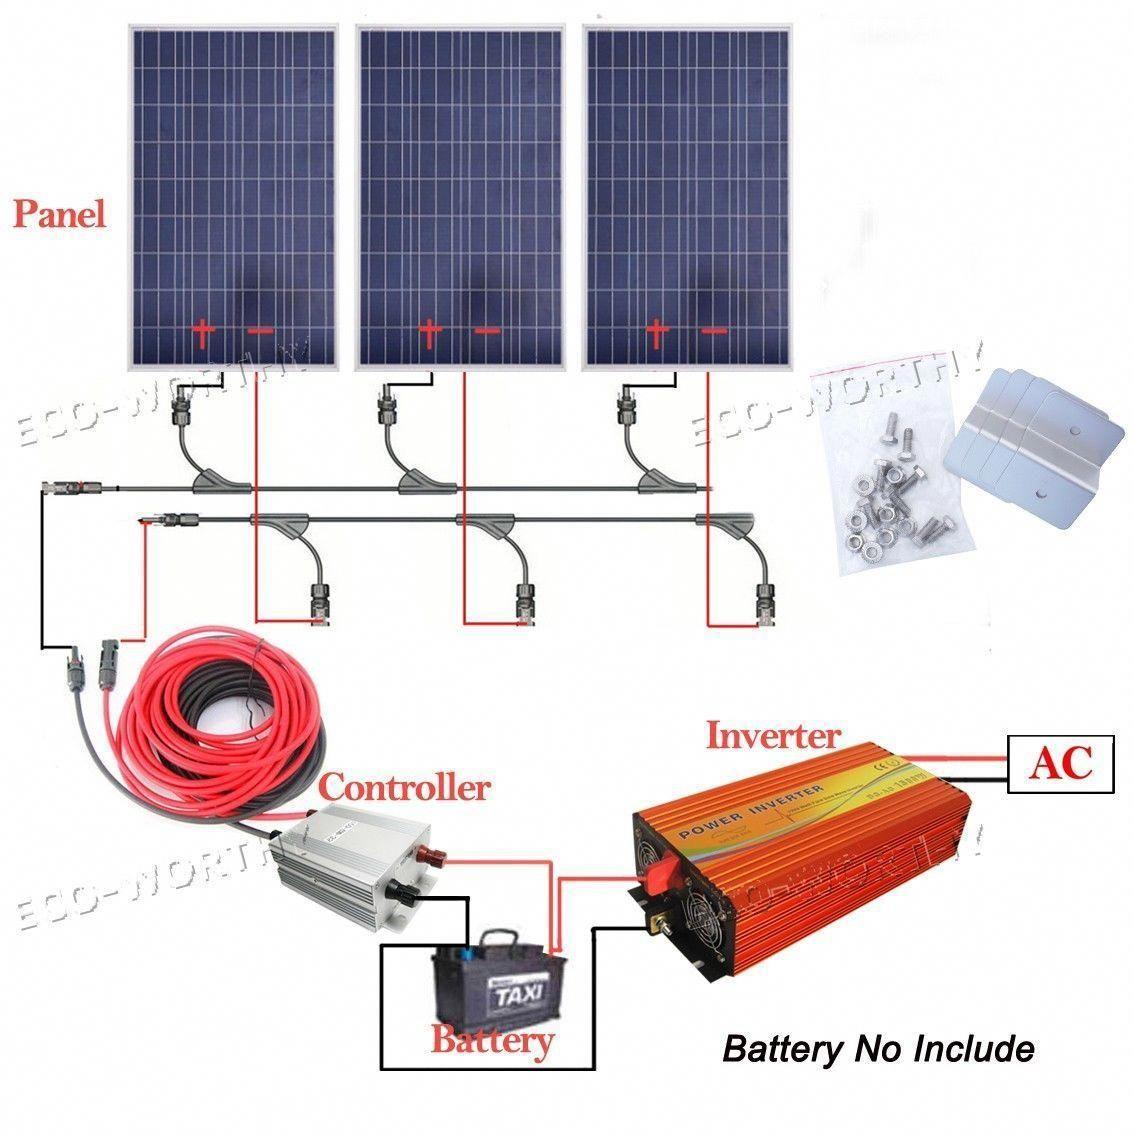 200w 300w 400w 800w Off Grid System 100w Solar Panel W 1kw 1500w 3000w Inverter In Home Garden Home Im Solar Panels Solar Panels For Home Best Solar Panels